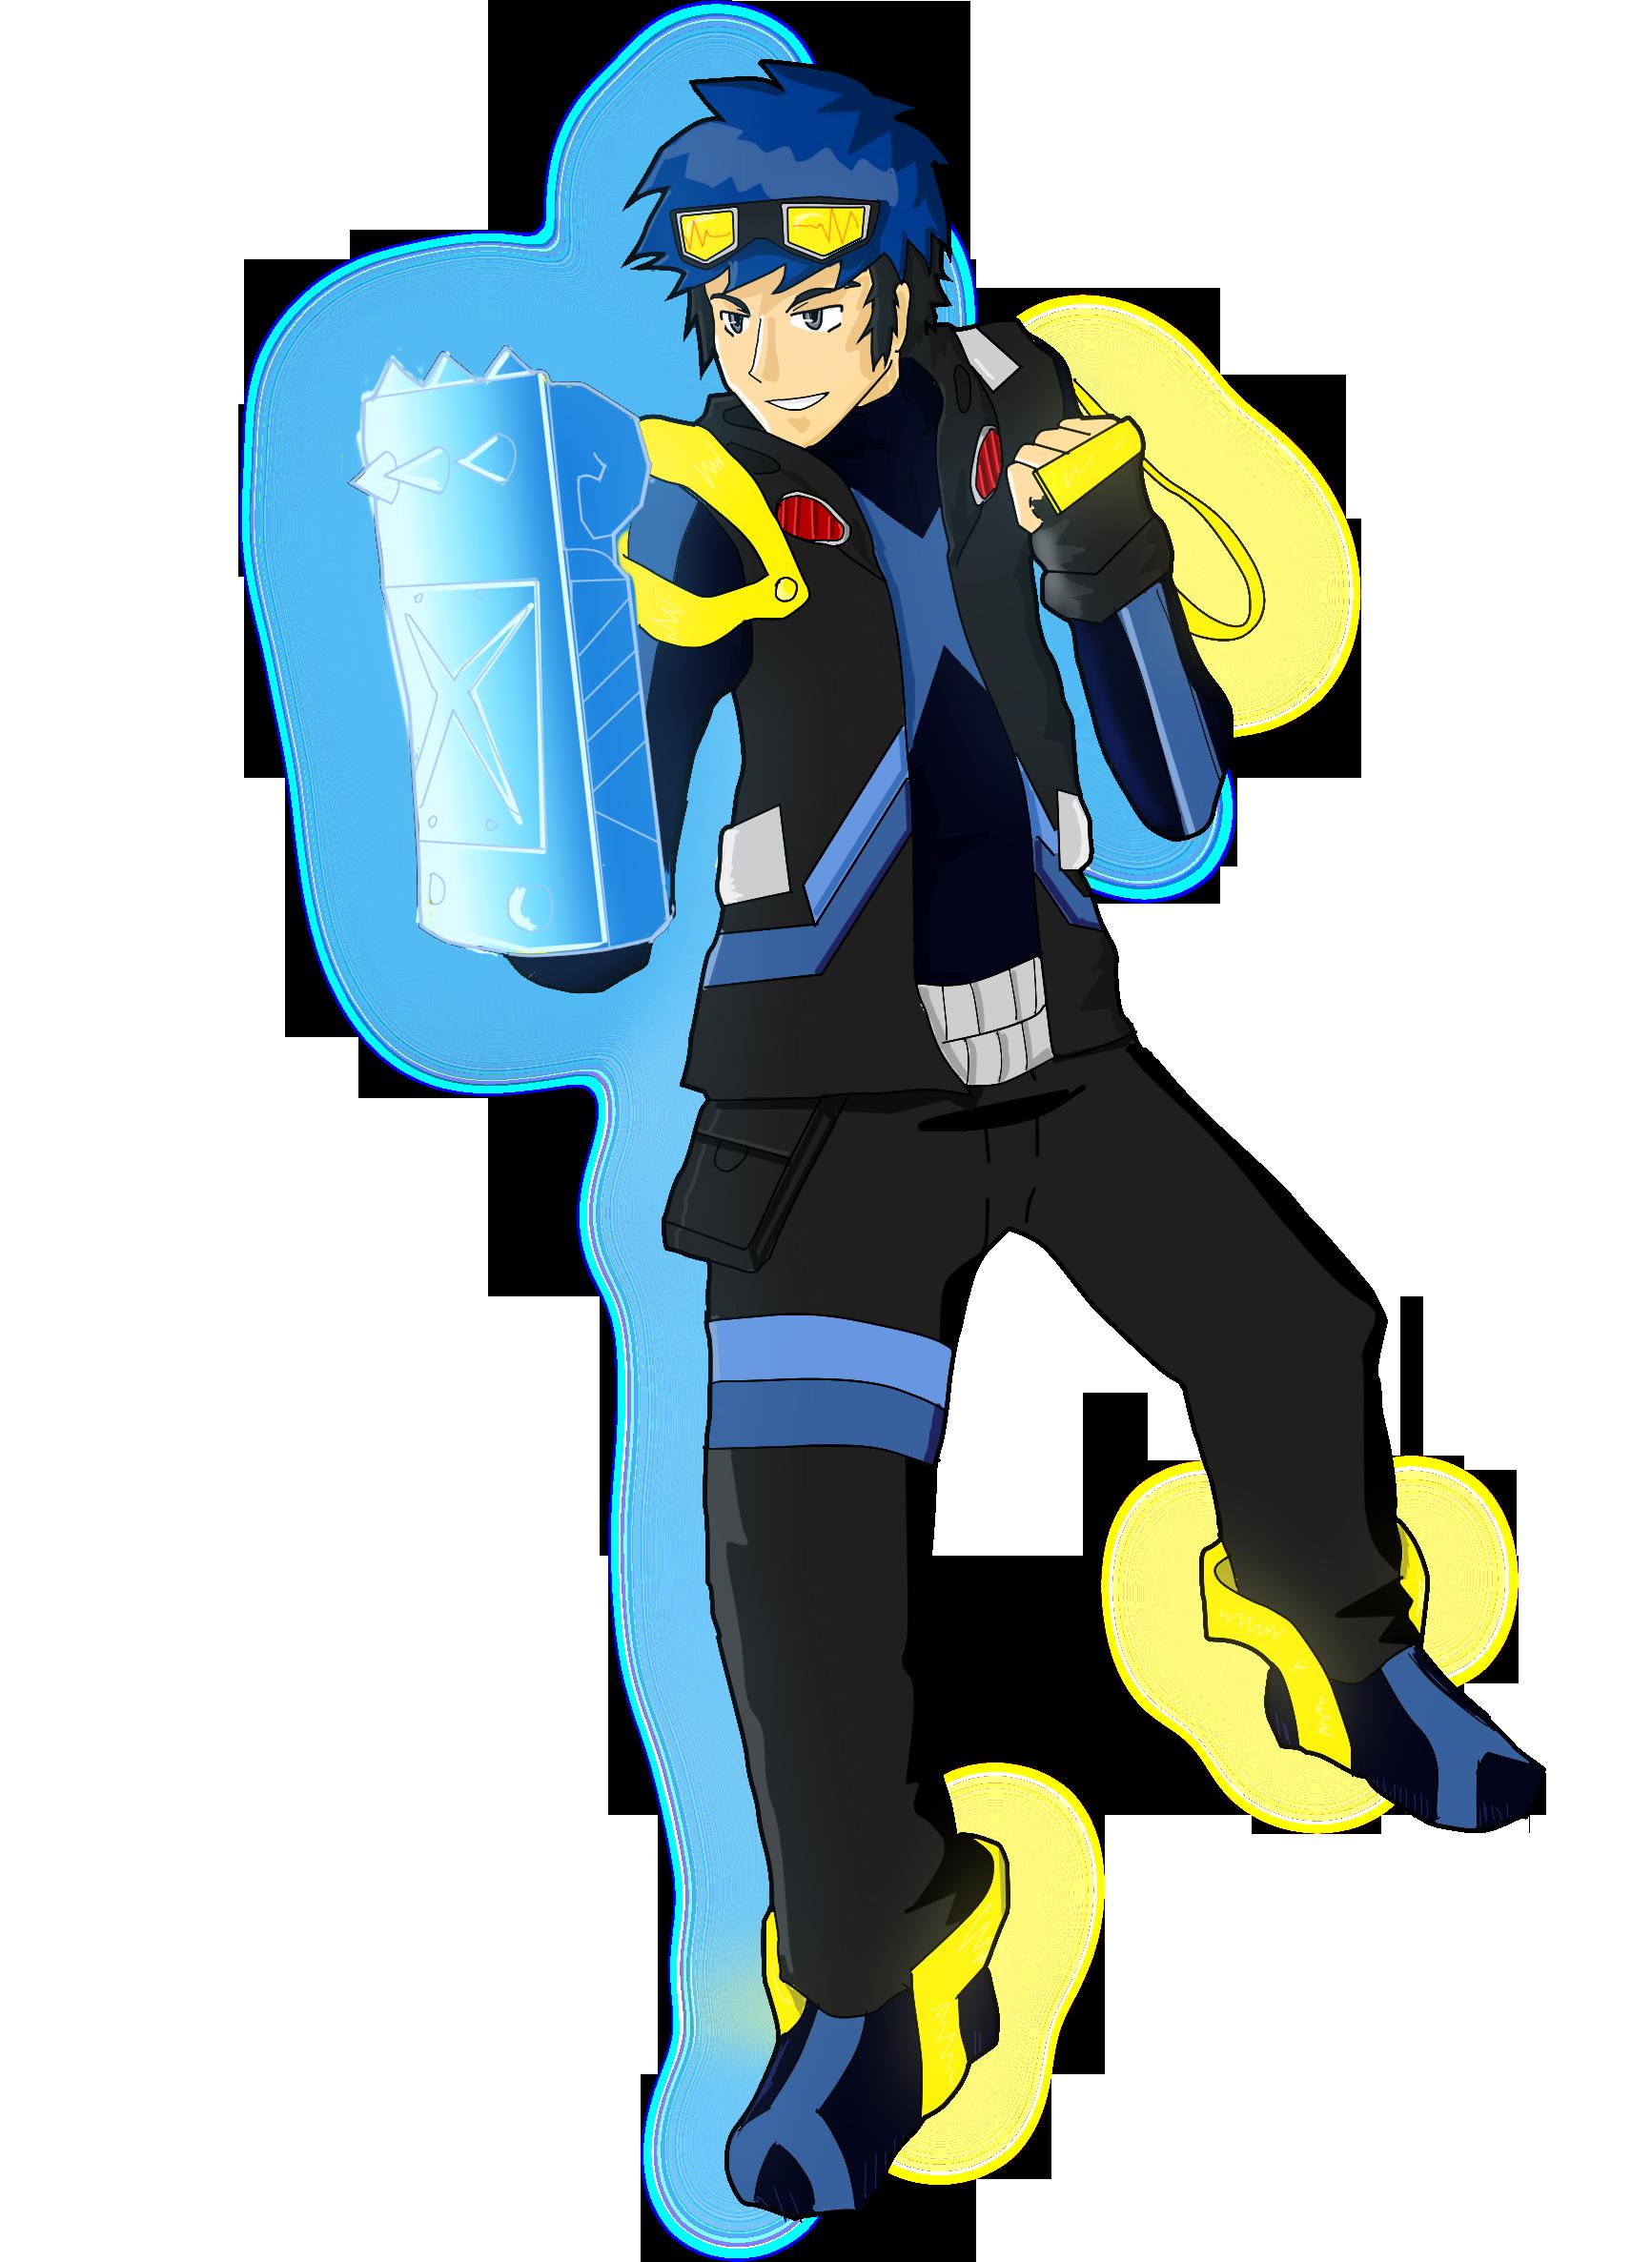 Last Version of Main Character